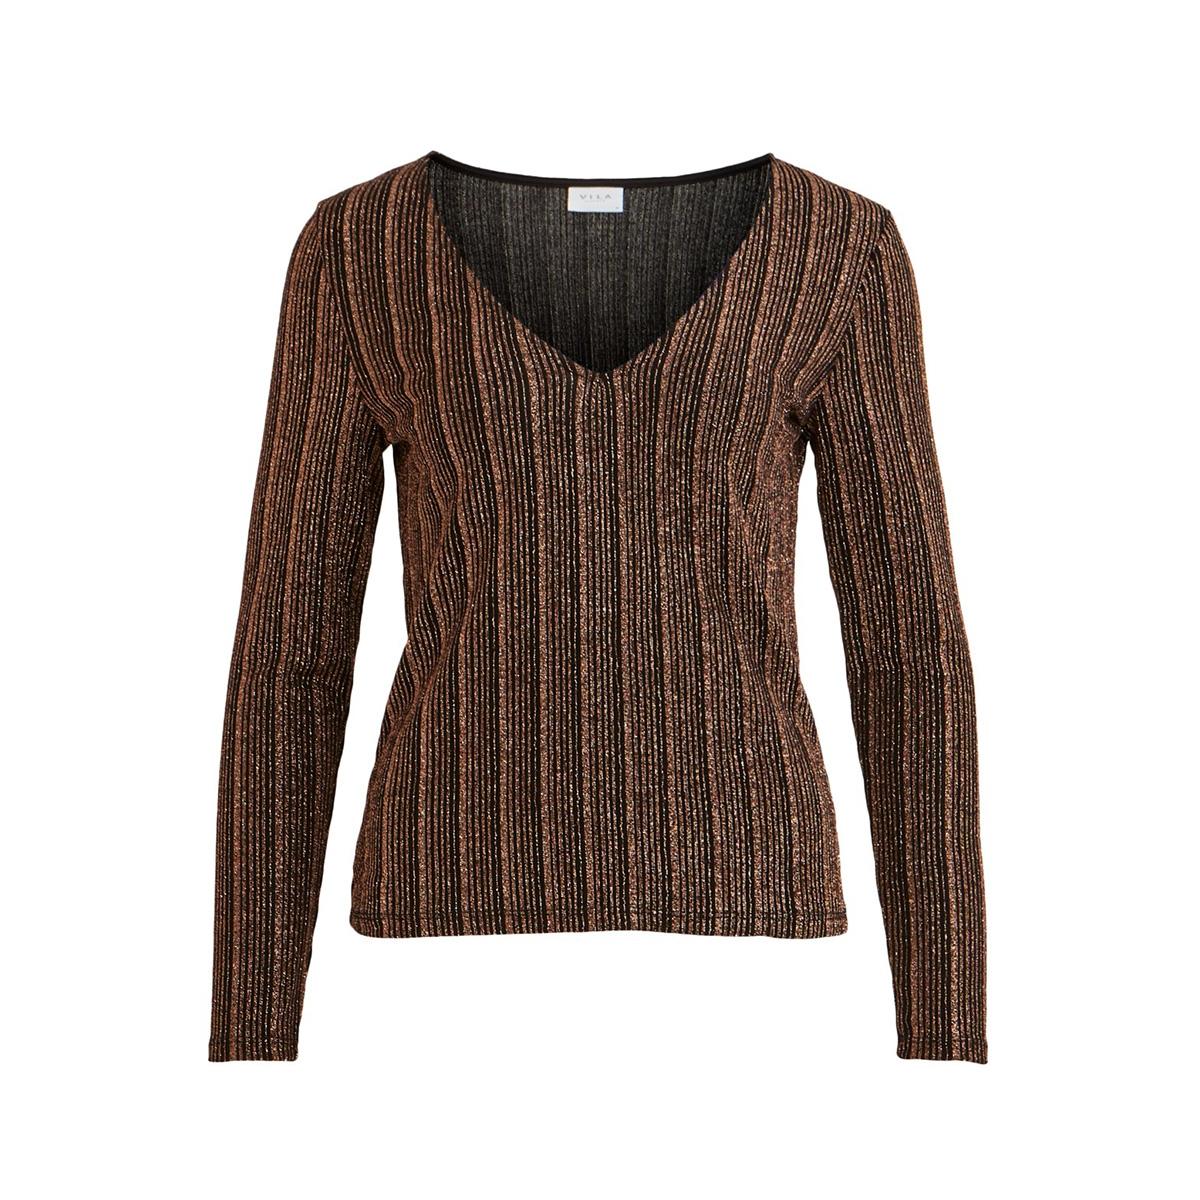 visual v-neck l/s top 14054758 vila t-shirt black/w. cobber